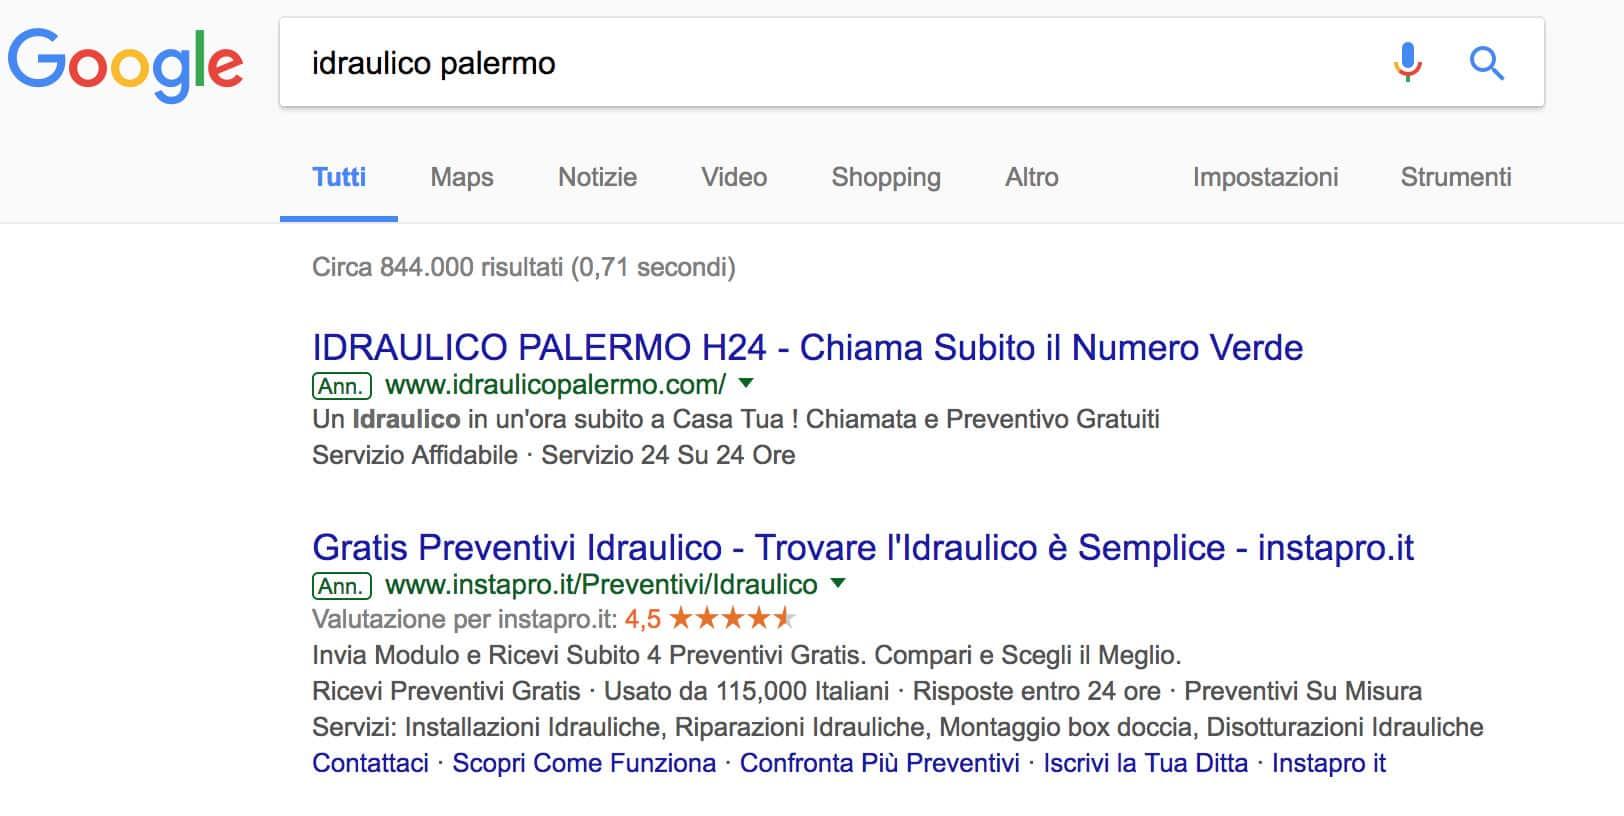 idraulico-palermo - google adwords